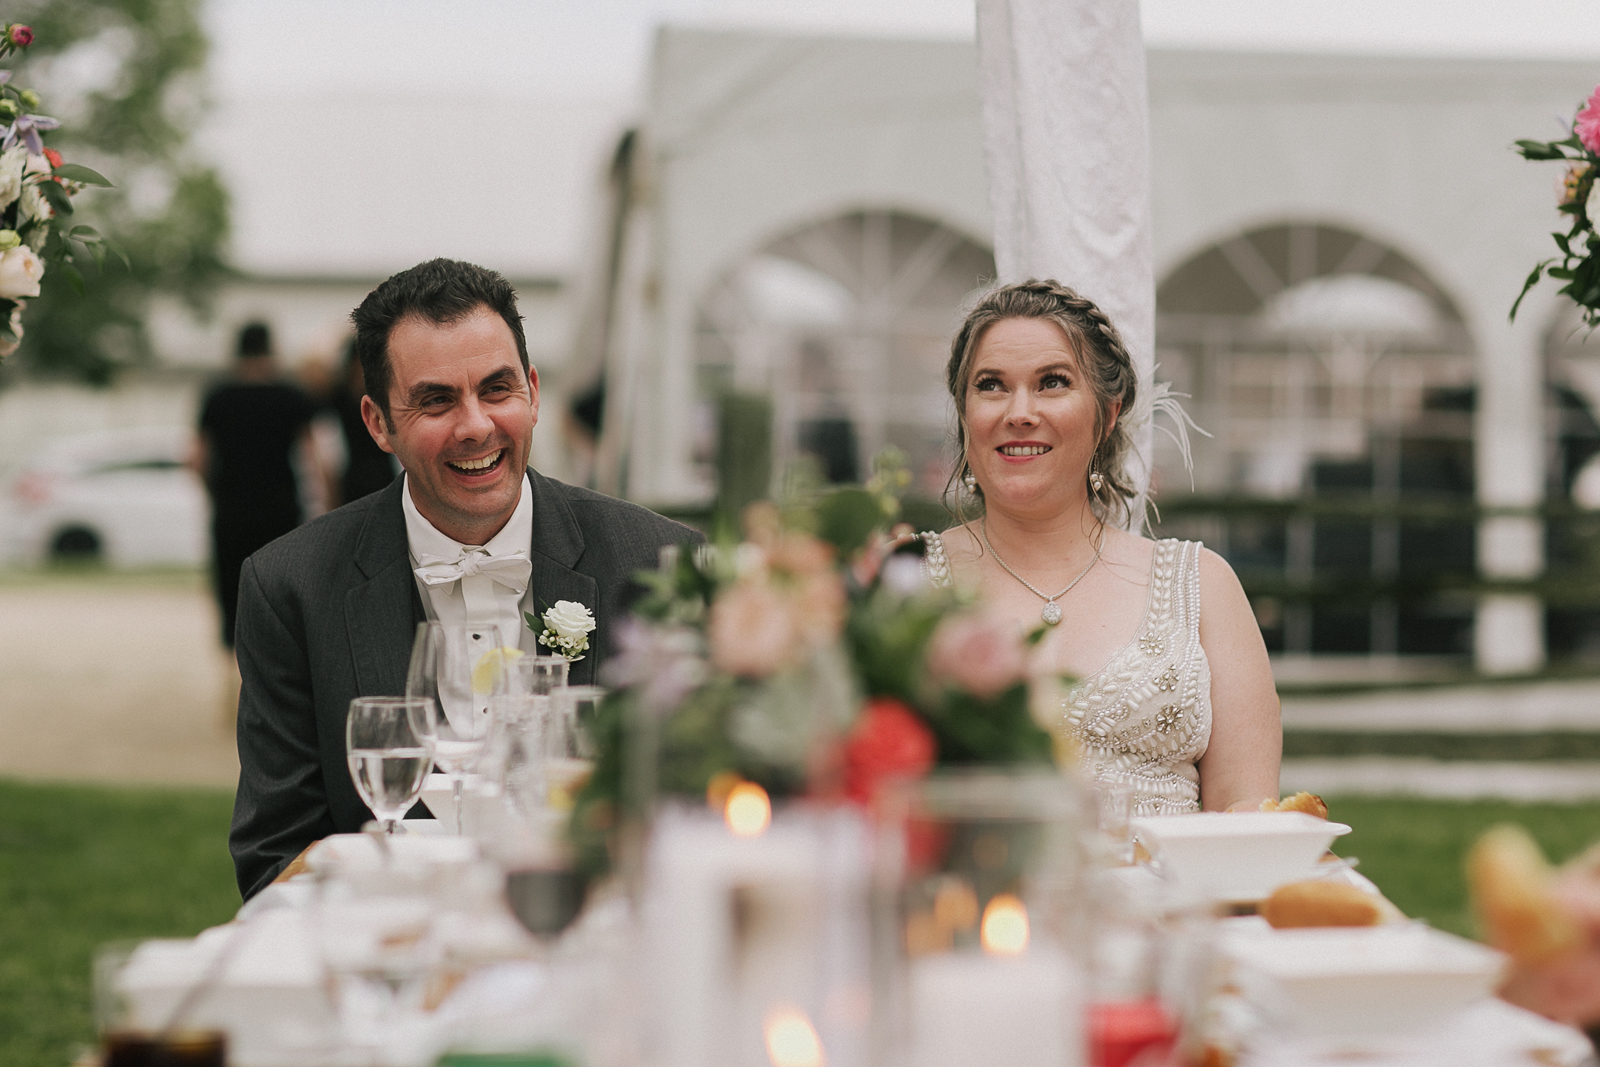 mike-and-jenni-wedding-466.jpg